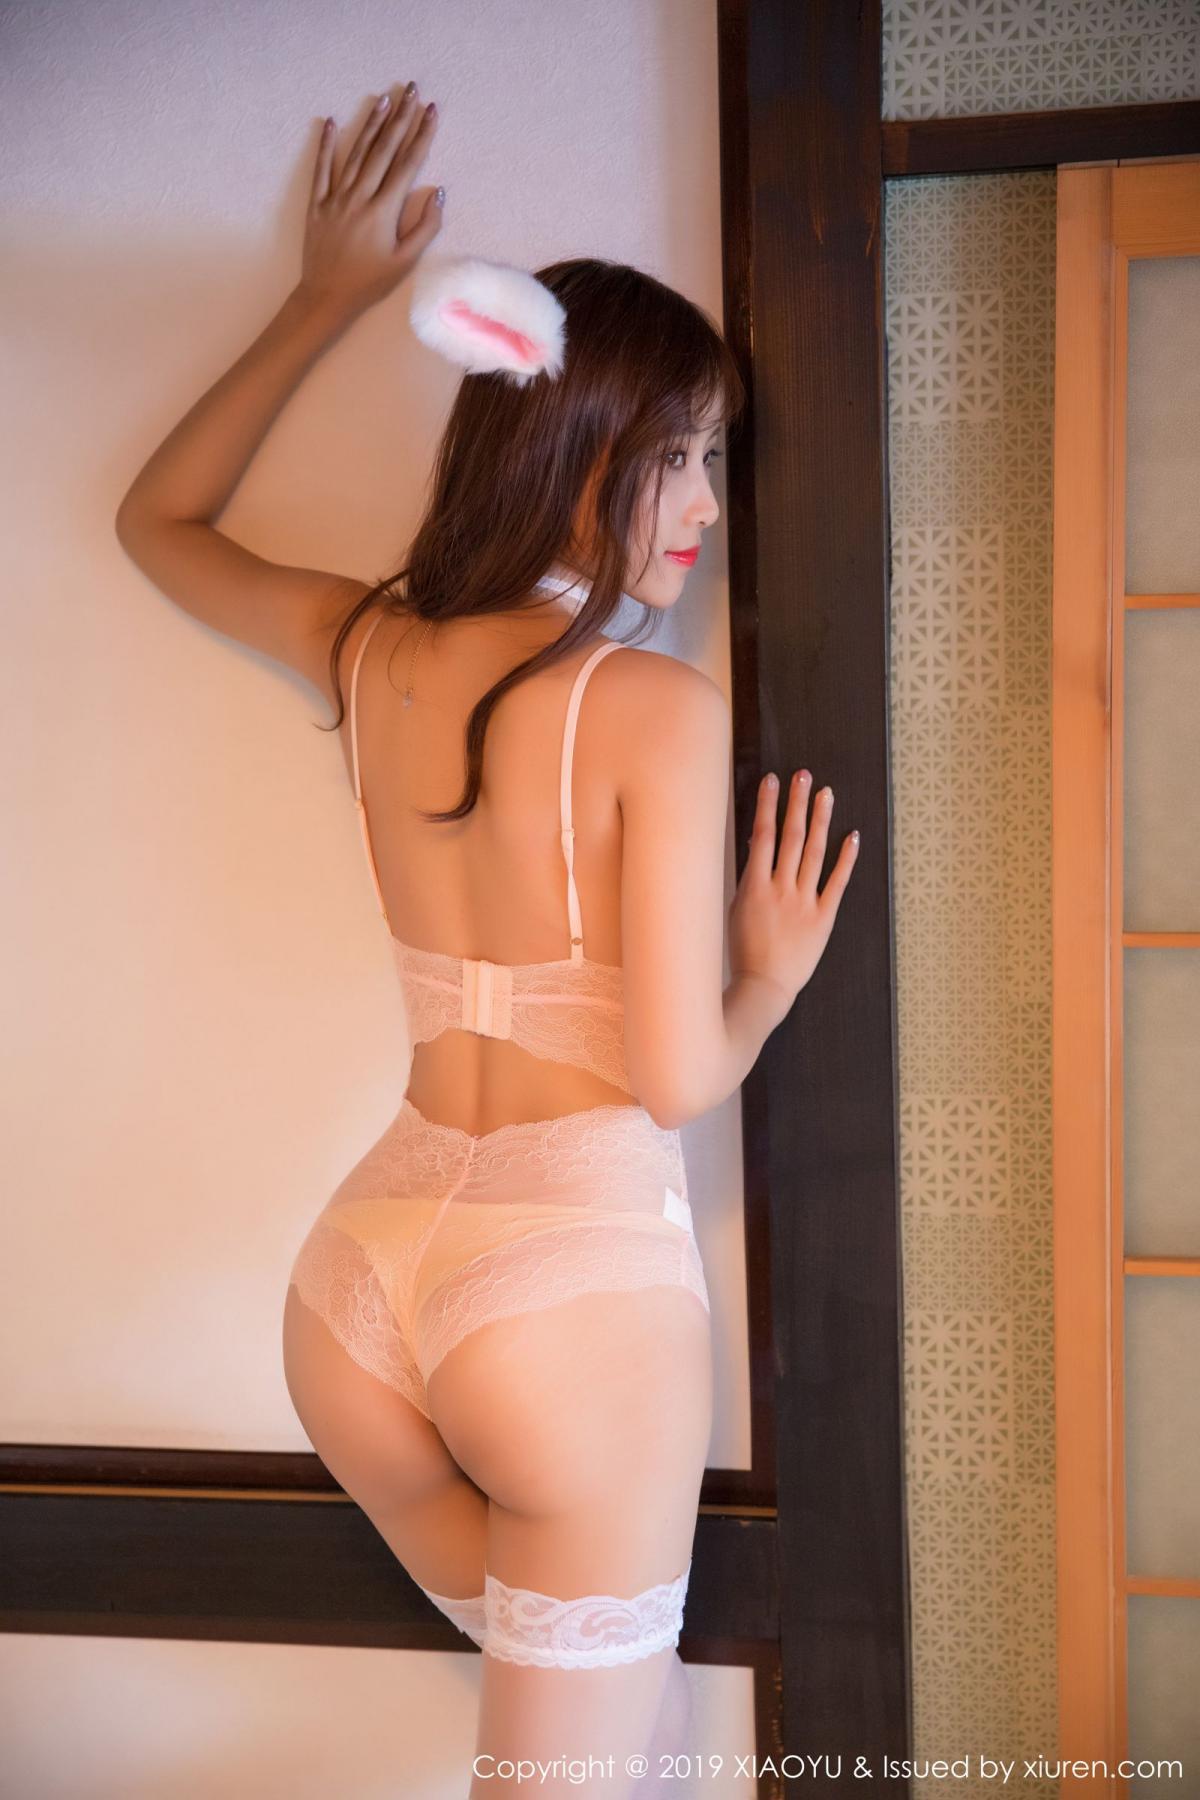 [XiaoYu] Vol.001 Hu Ya Mao Bao 27P, Hu Ya Mao Bao, Tall, Underwear, XiaoYu